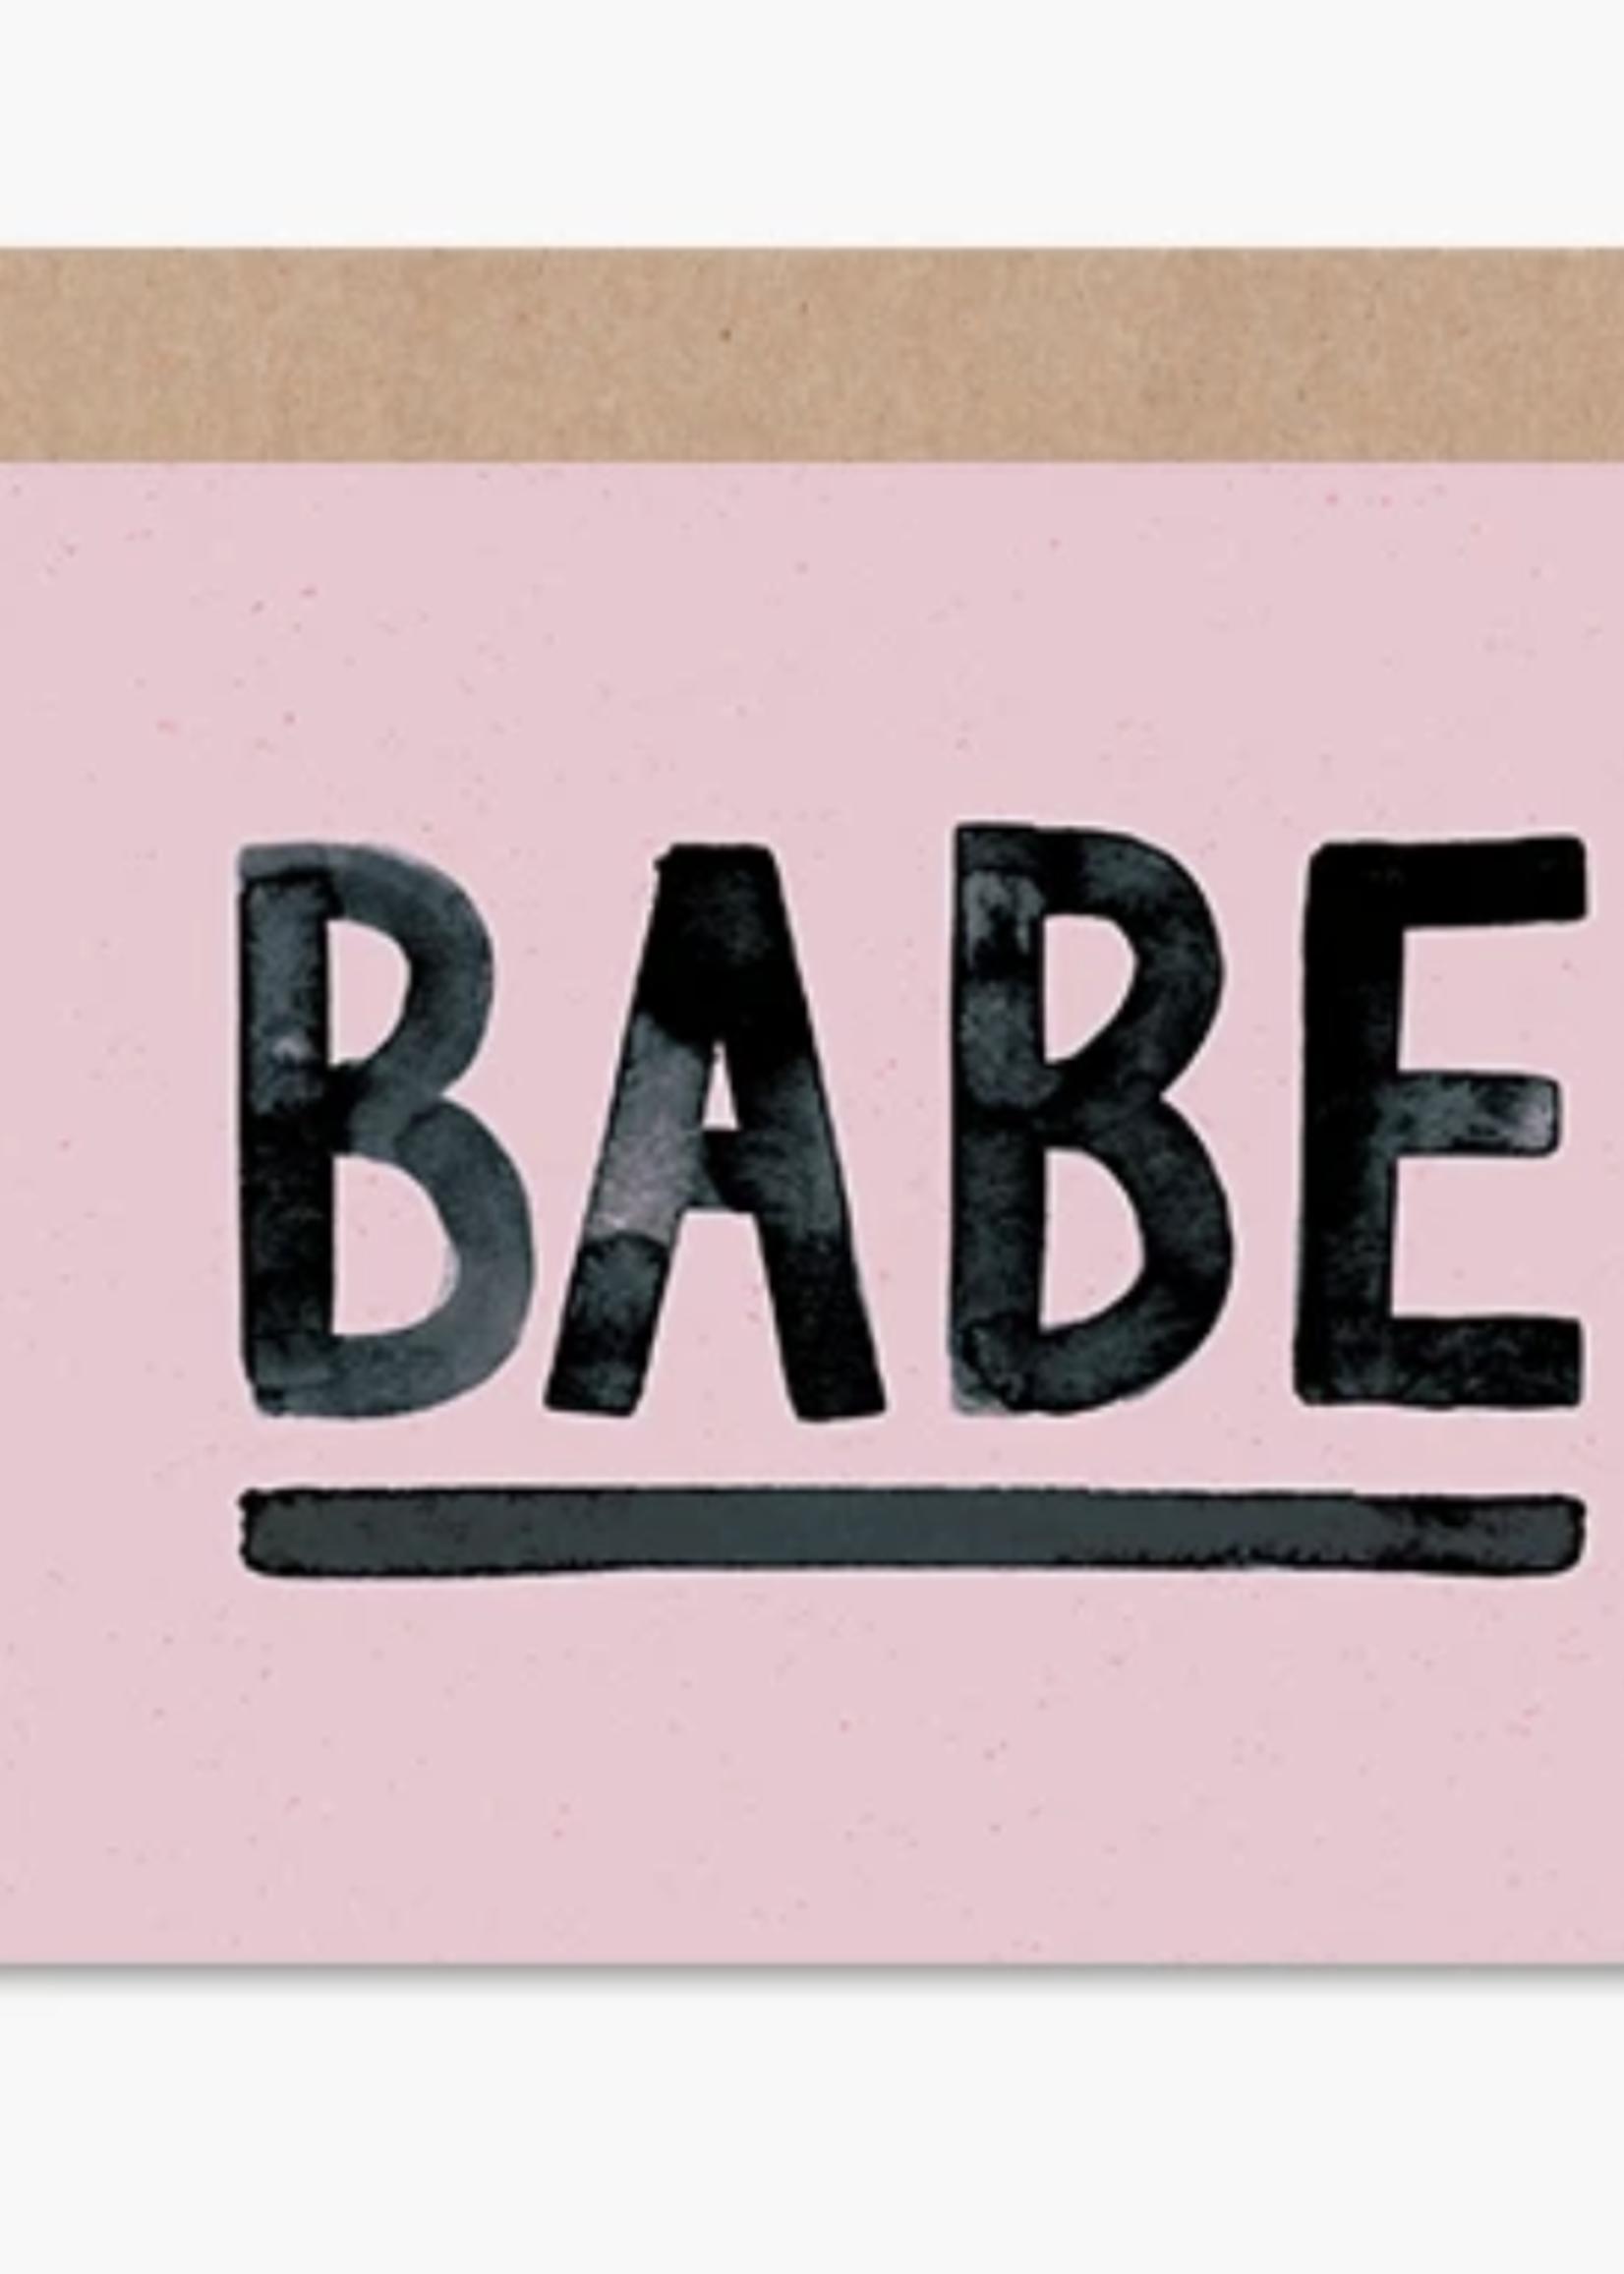 daydream prints babe card